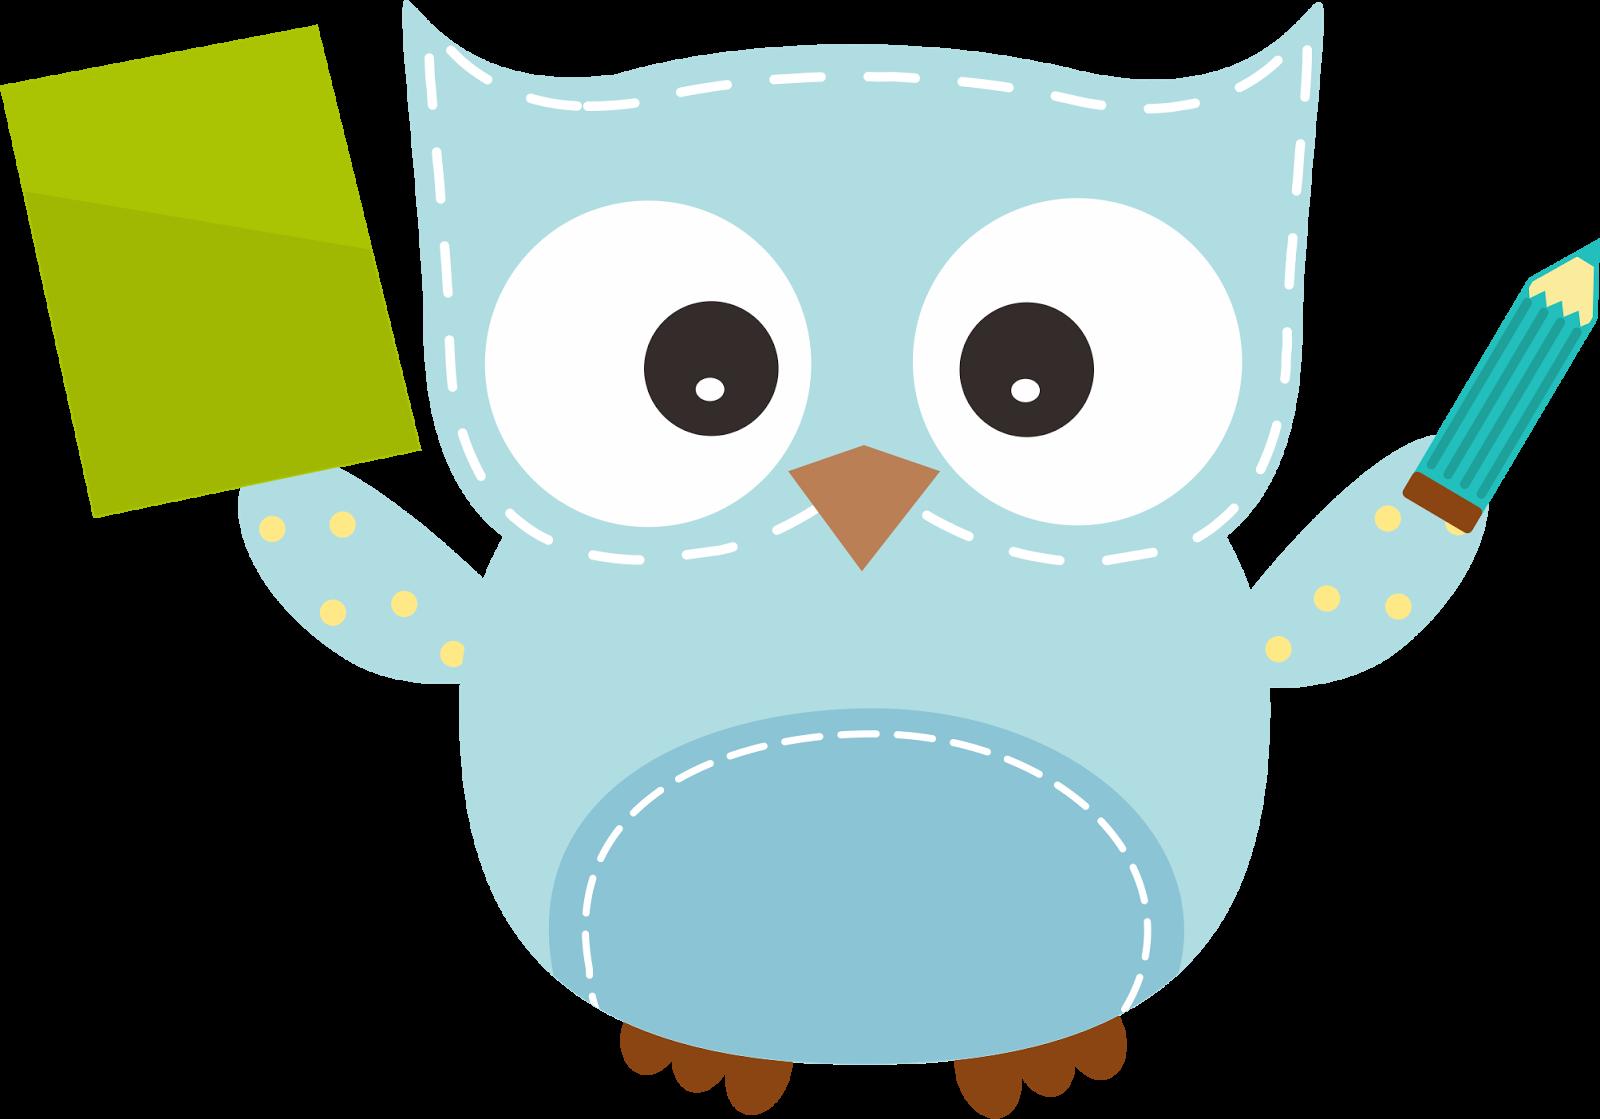 Cute owl free download. Owls clipart school